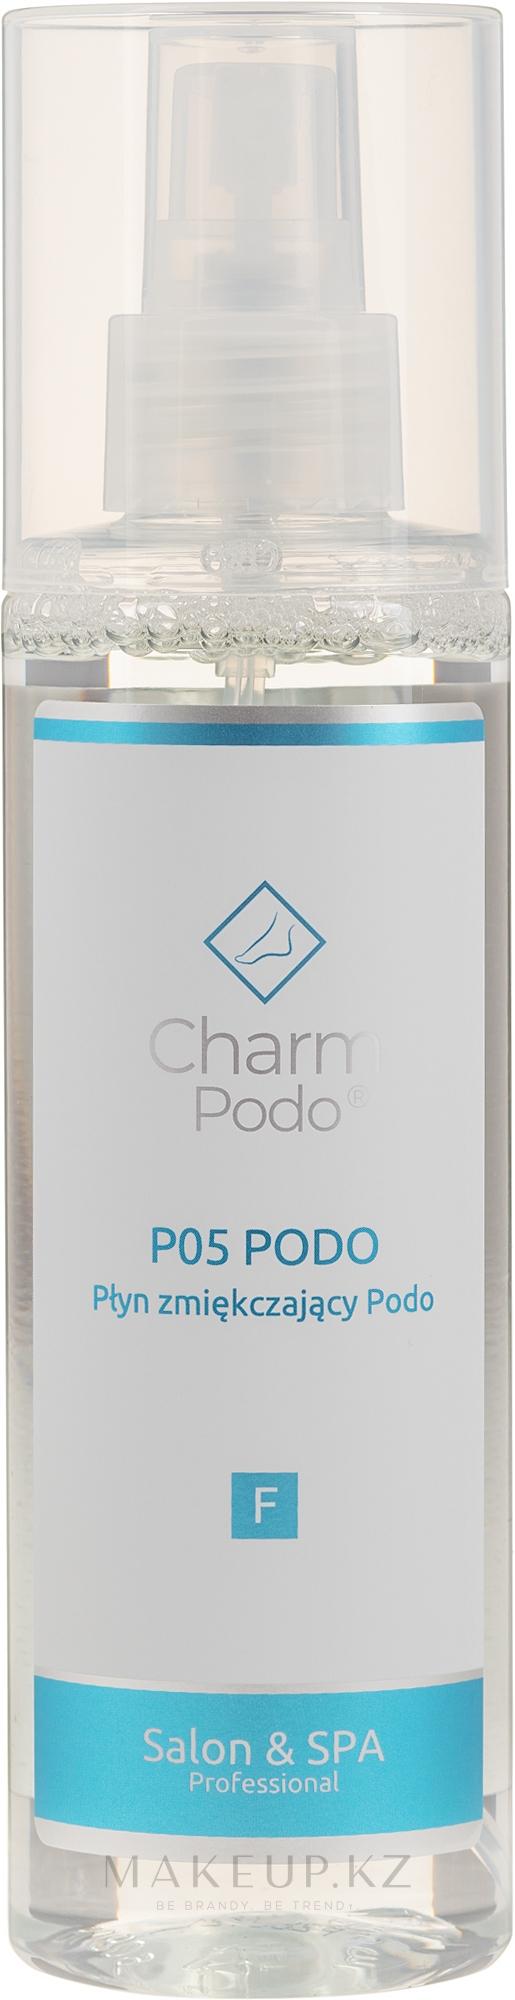 Лосьон для смягчения кожи ног - Charmine Rose Charm Podo P05 — фото 200 ml